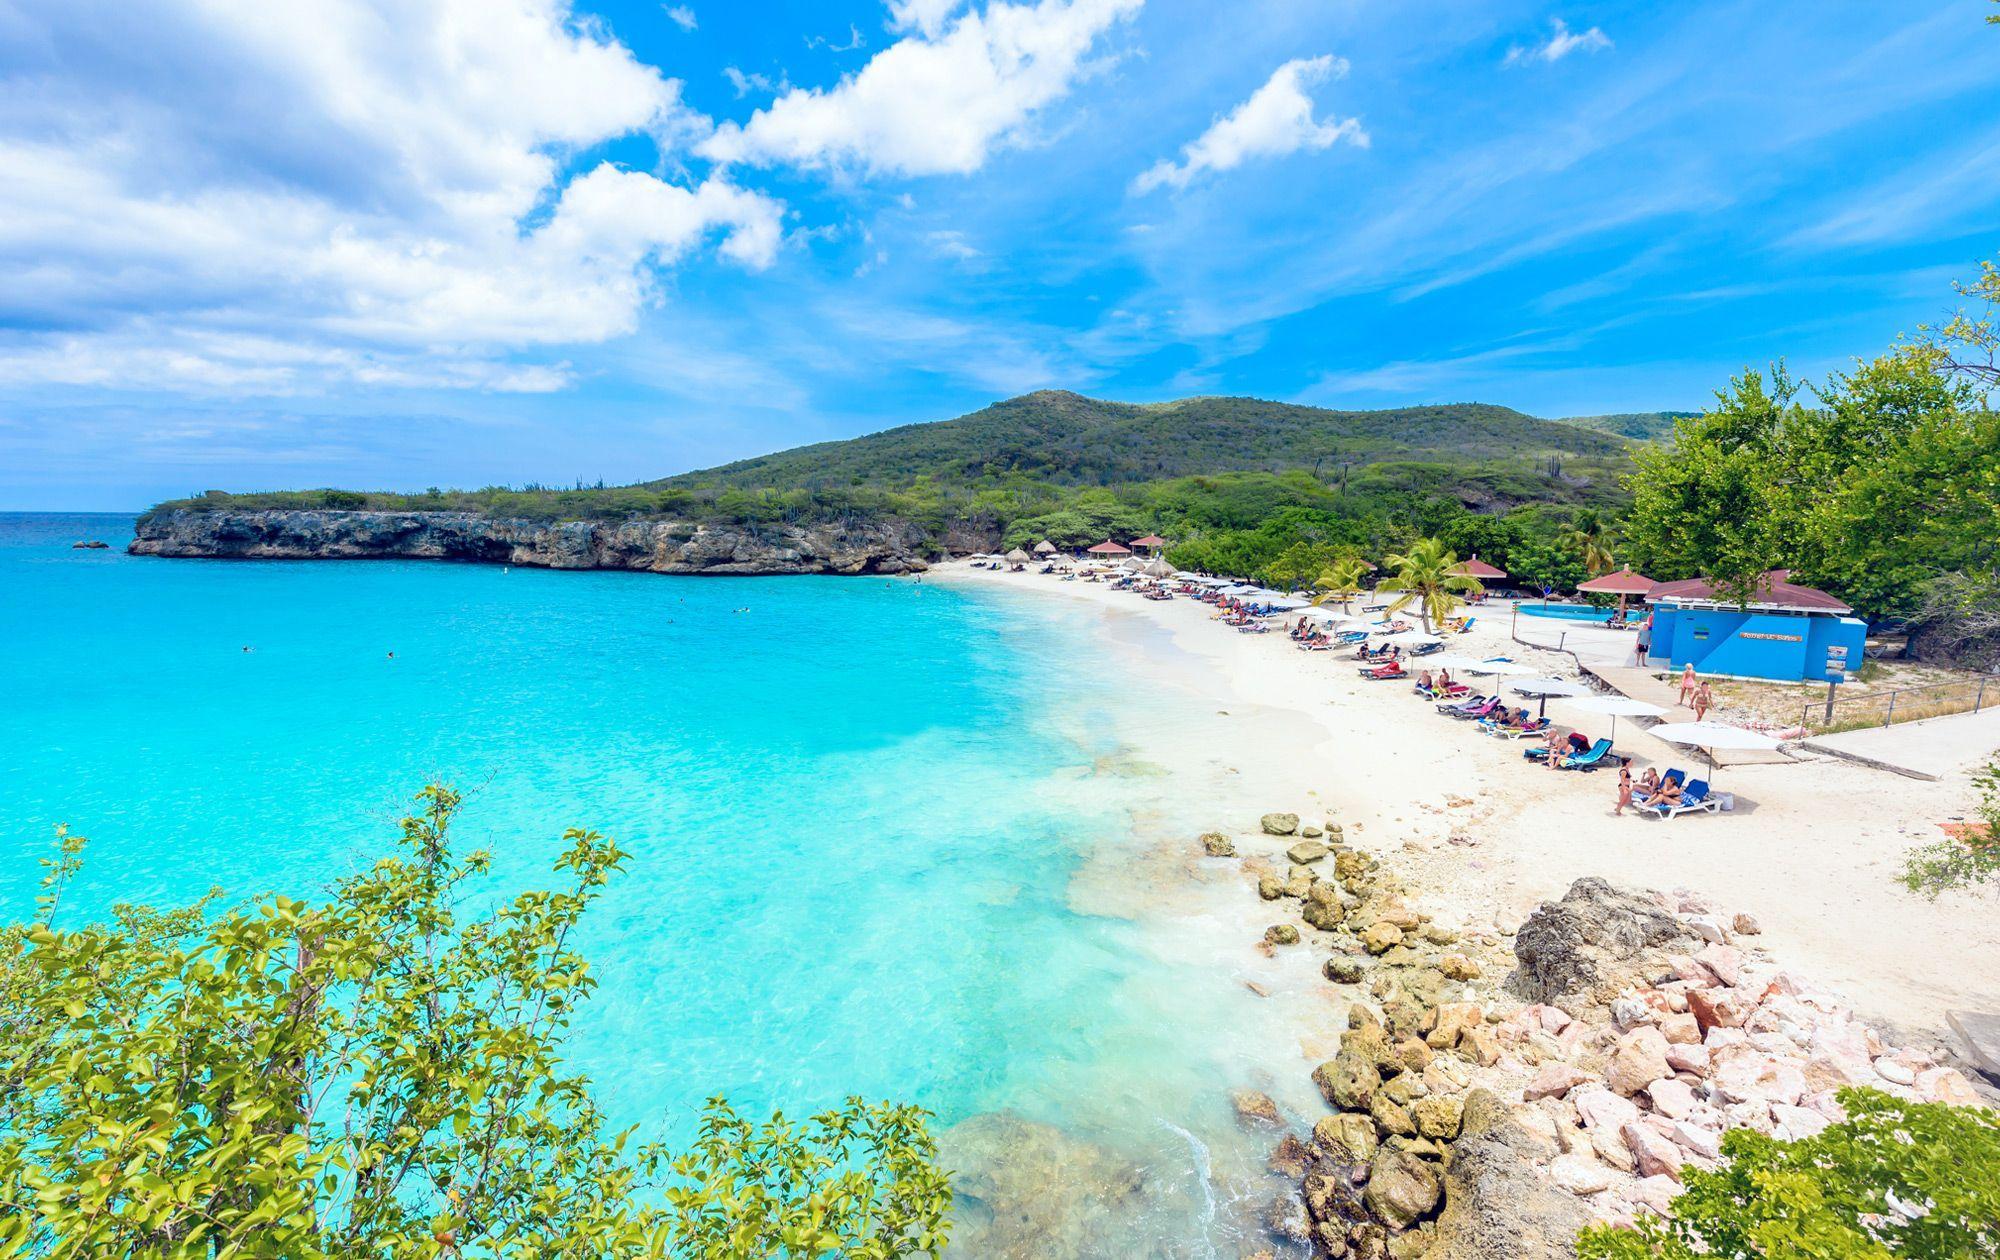 Playa-Kenepa-Grandi-2